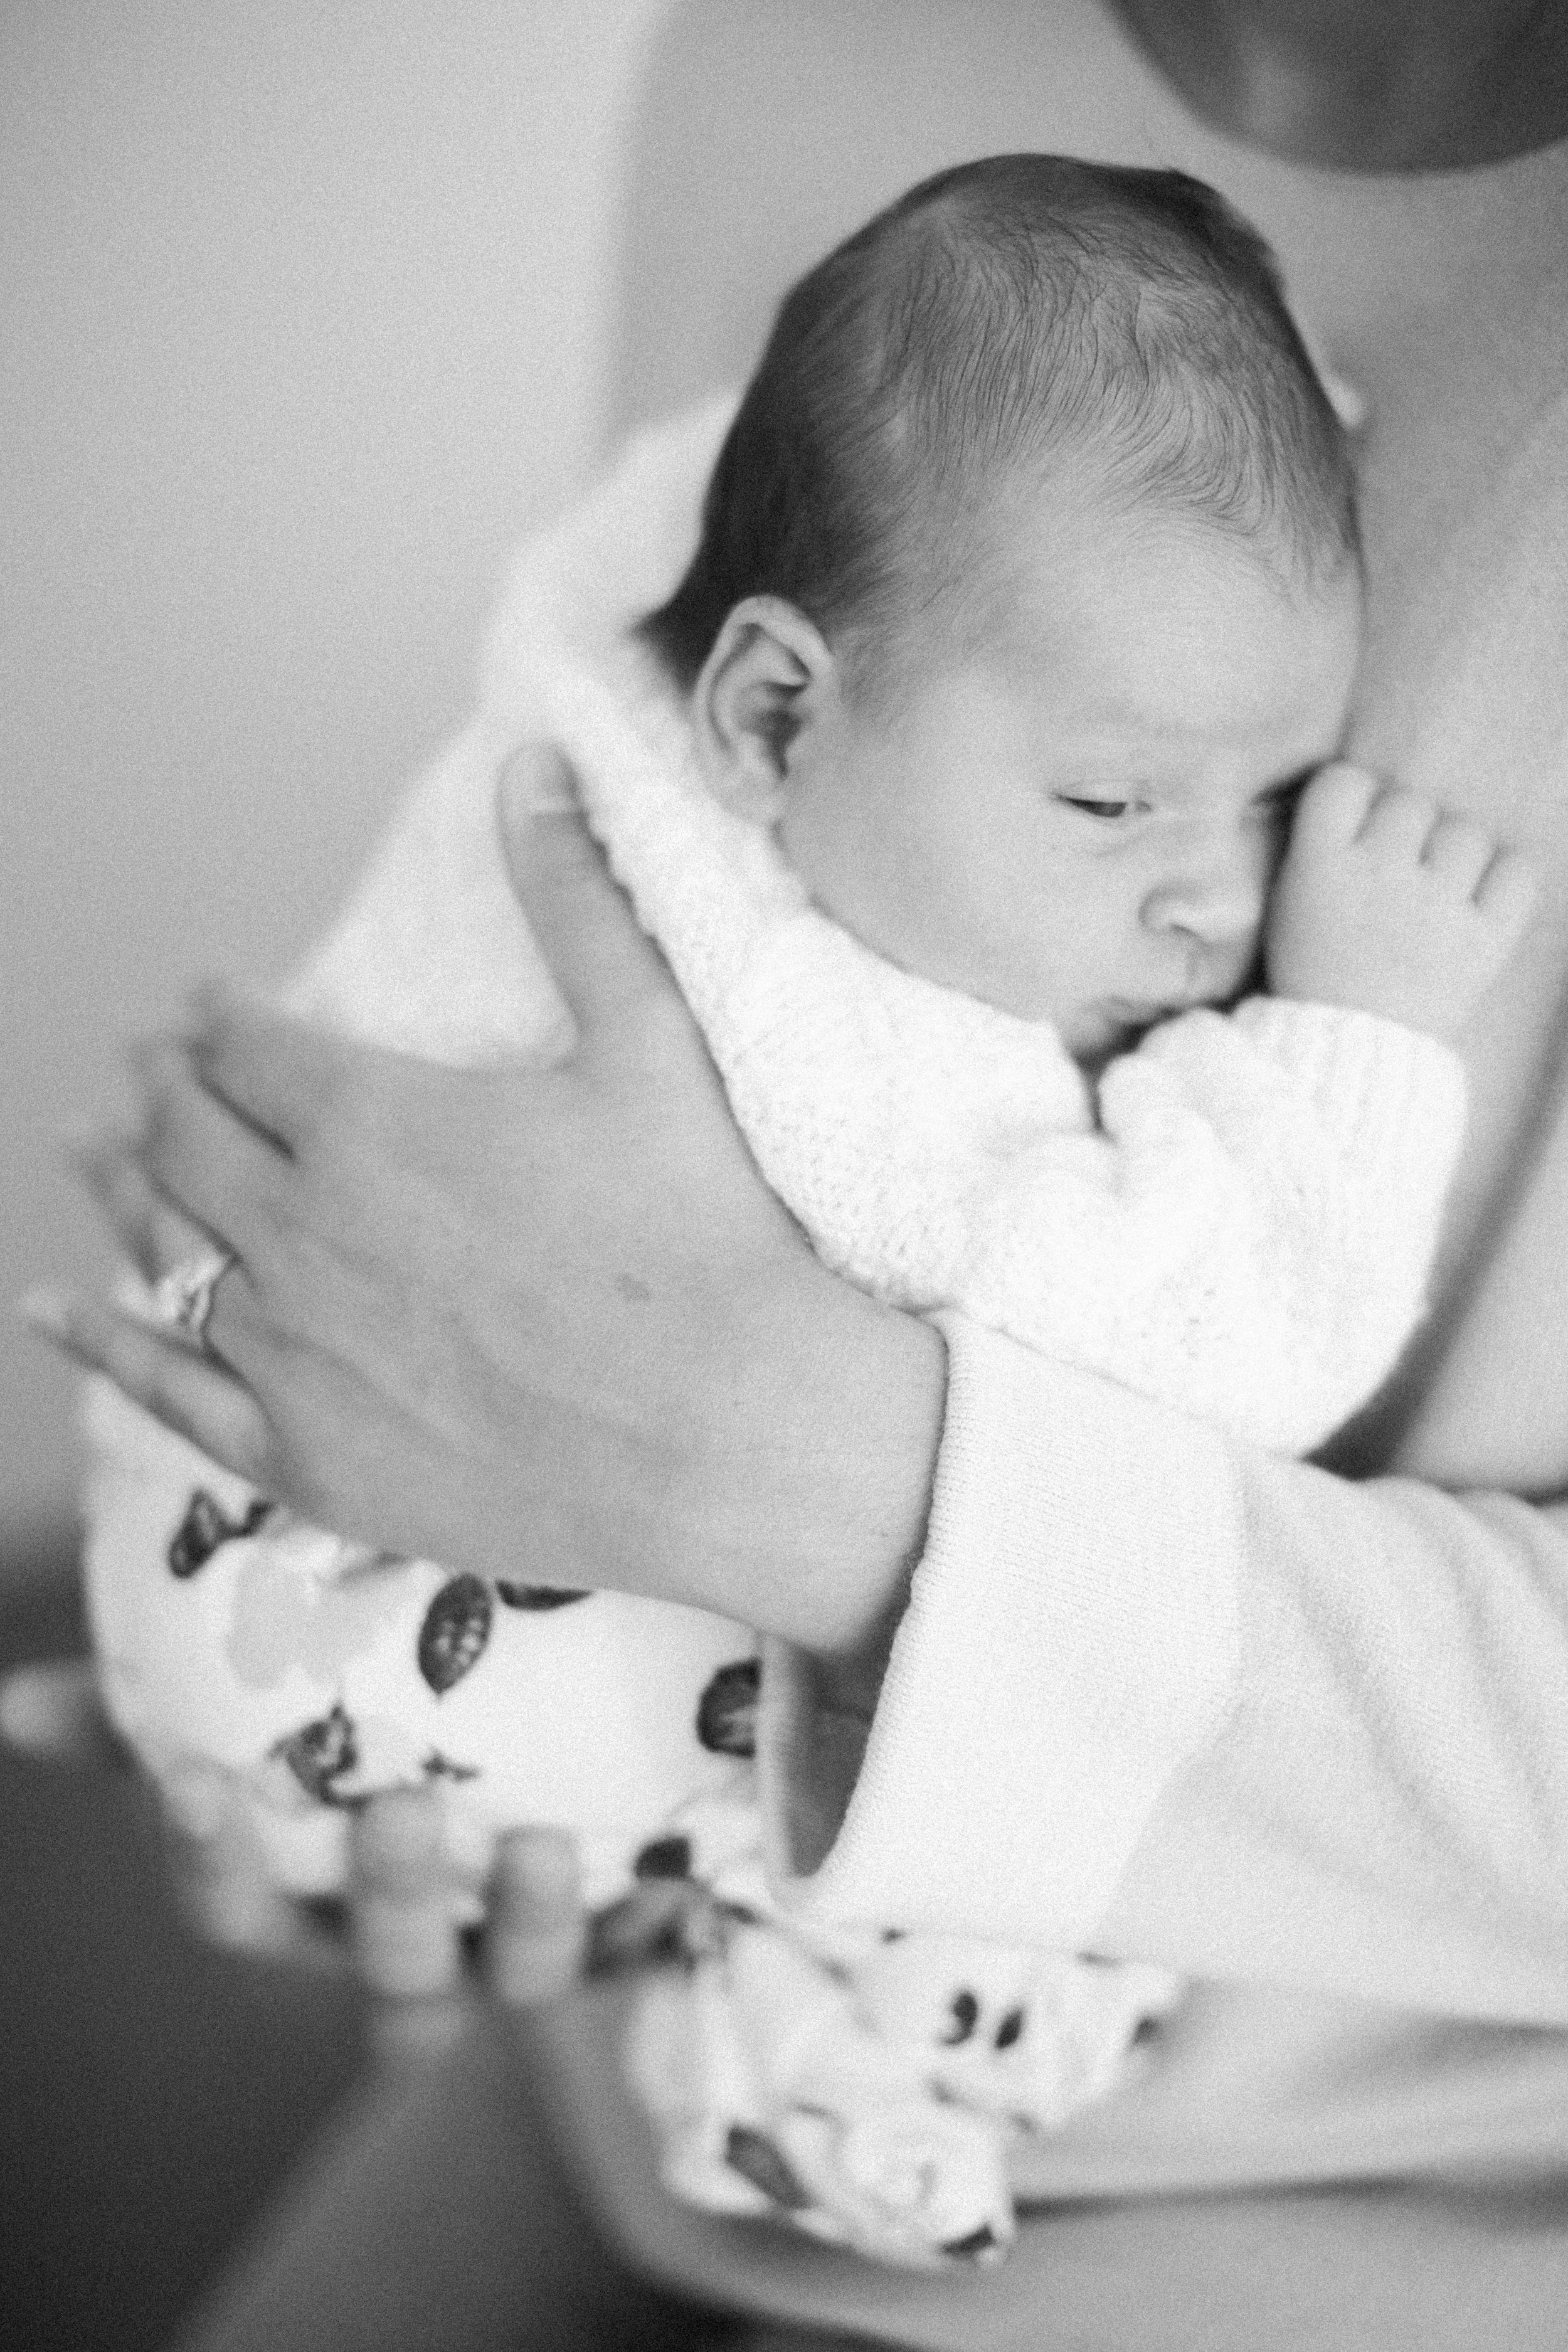 AmeliaClairePhotography_Mia_Newborn-1-56.jpeg